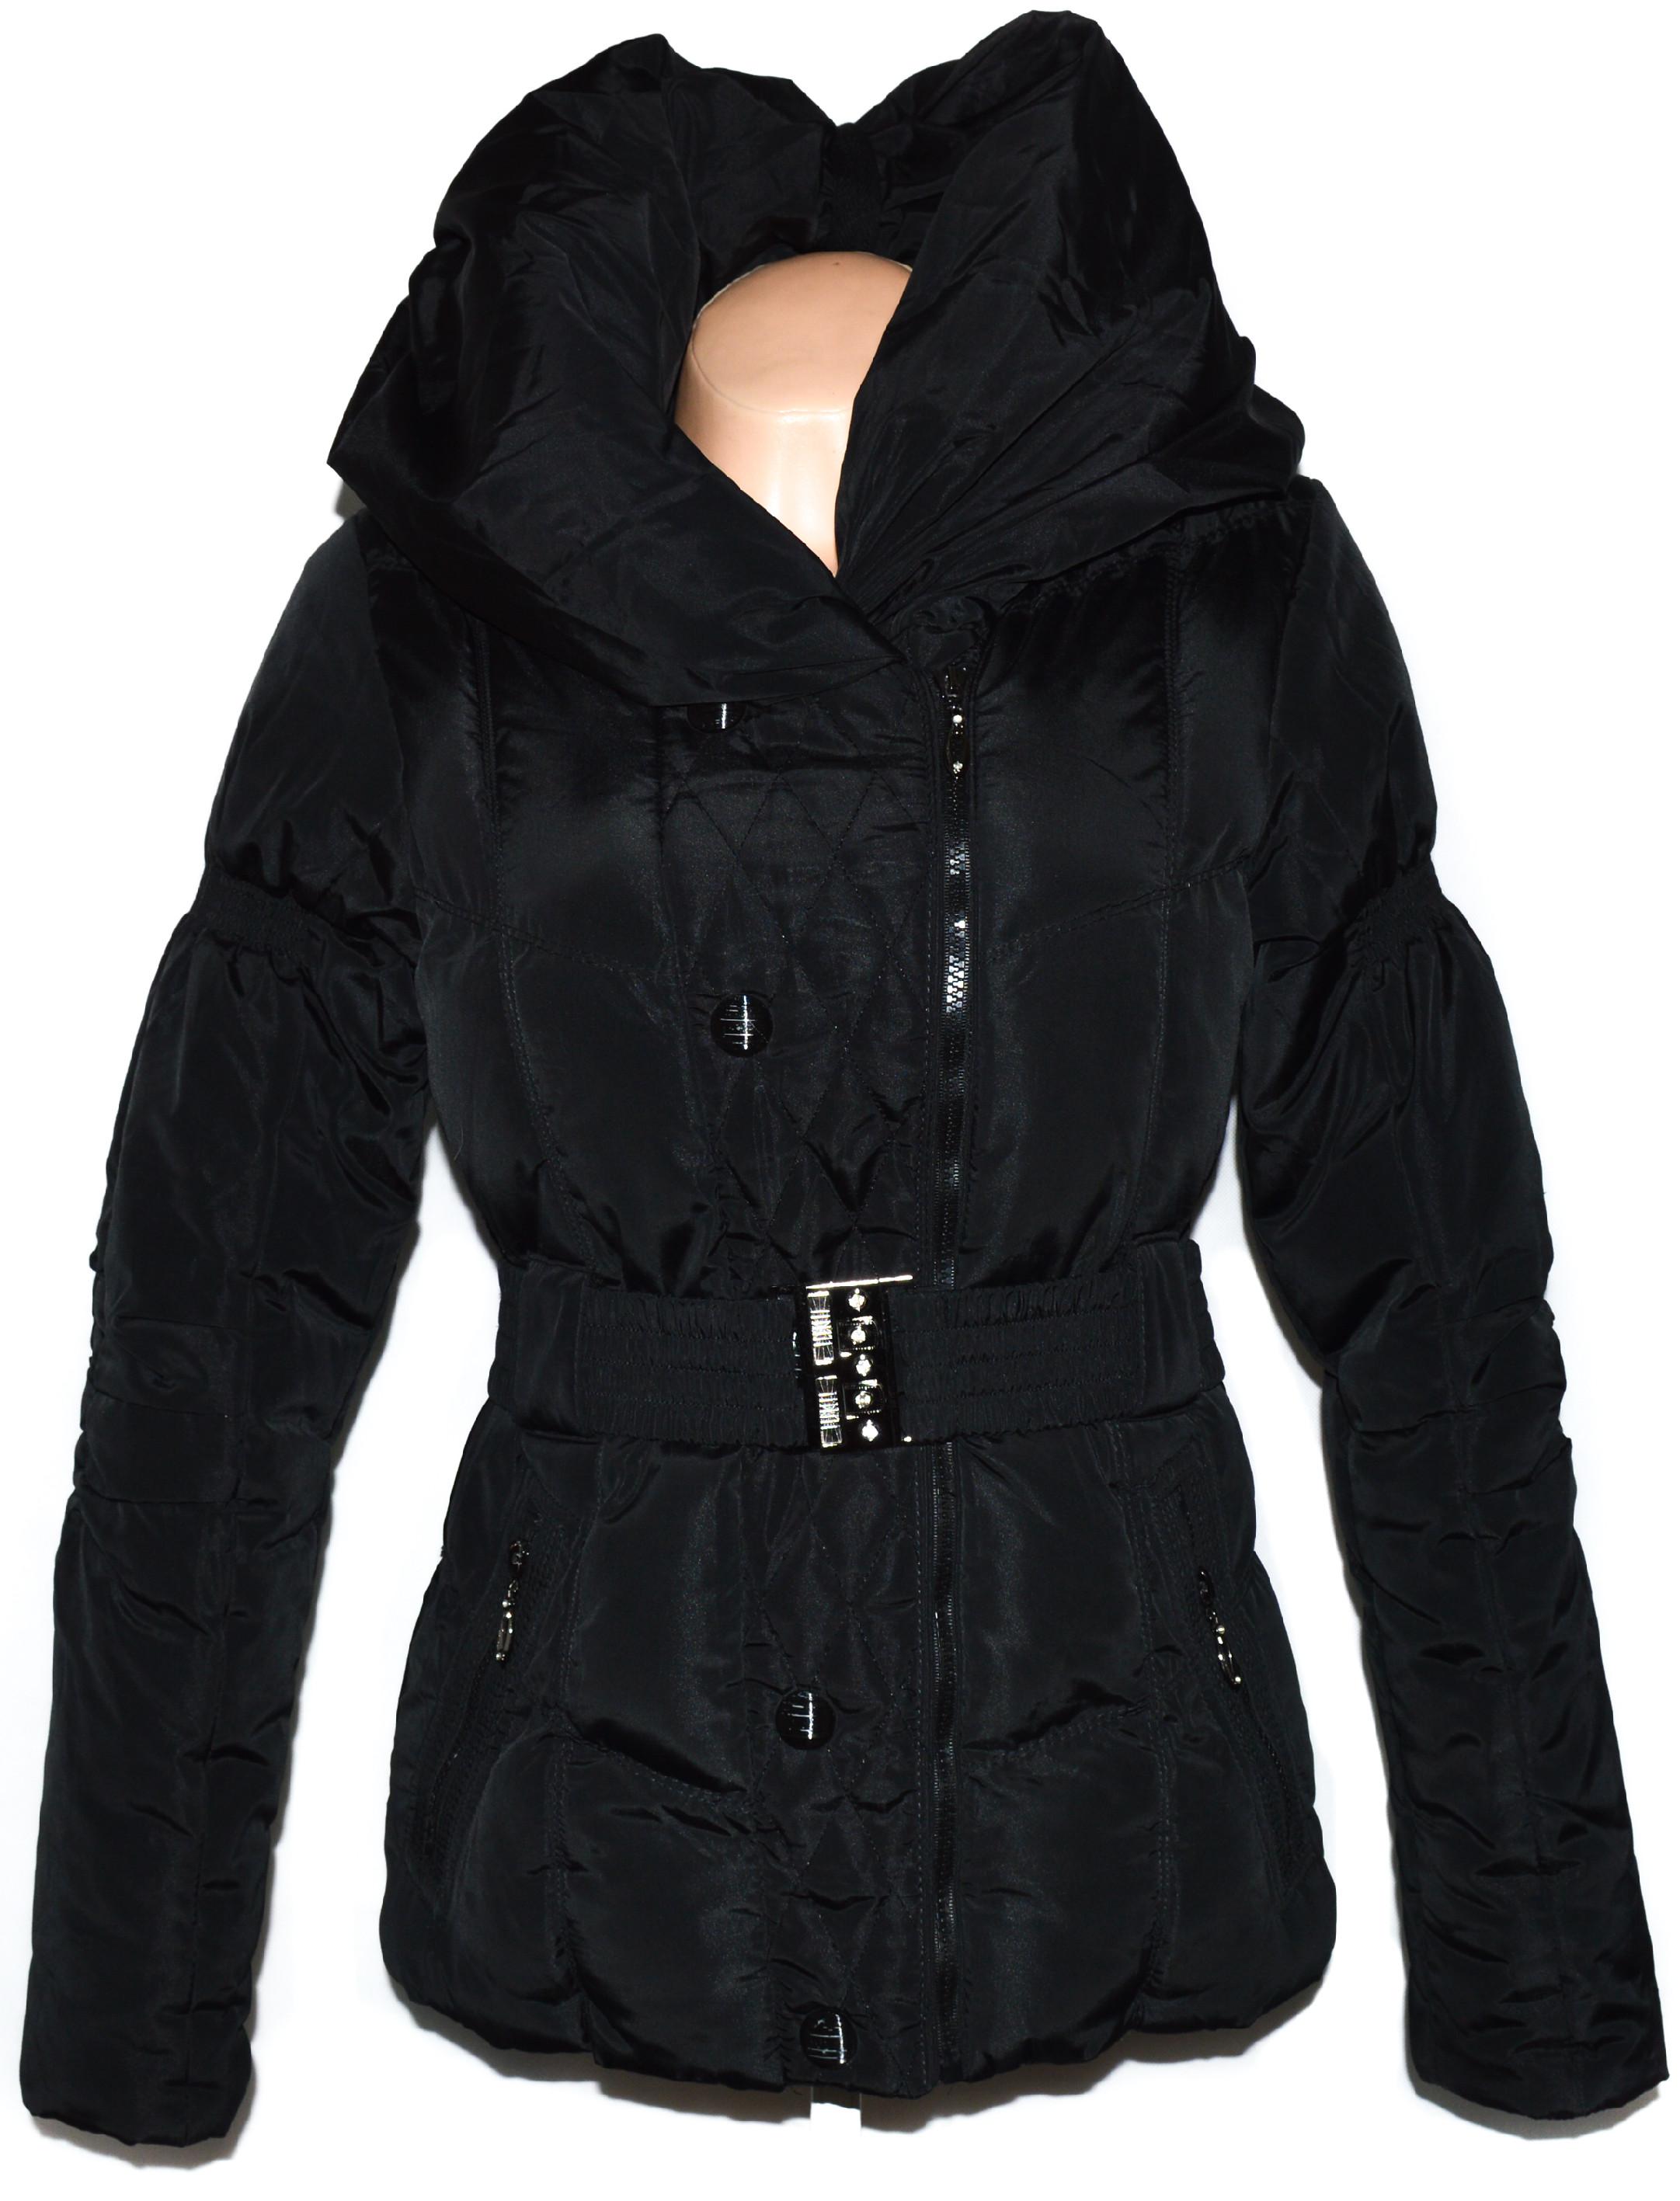 Dámský černý šusťákový kabátek - křivák s pásekm S